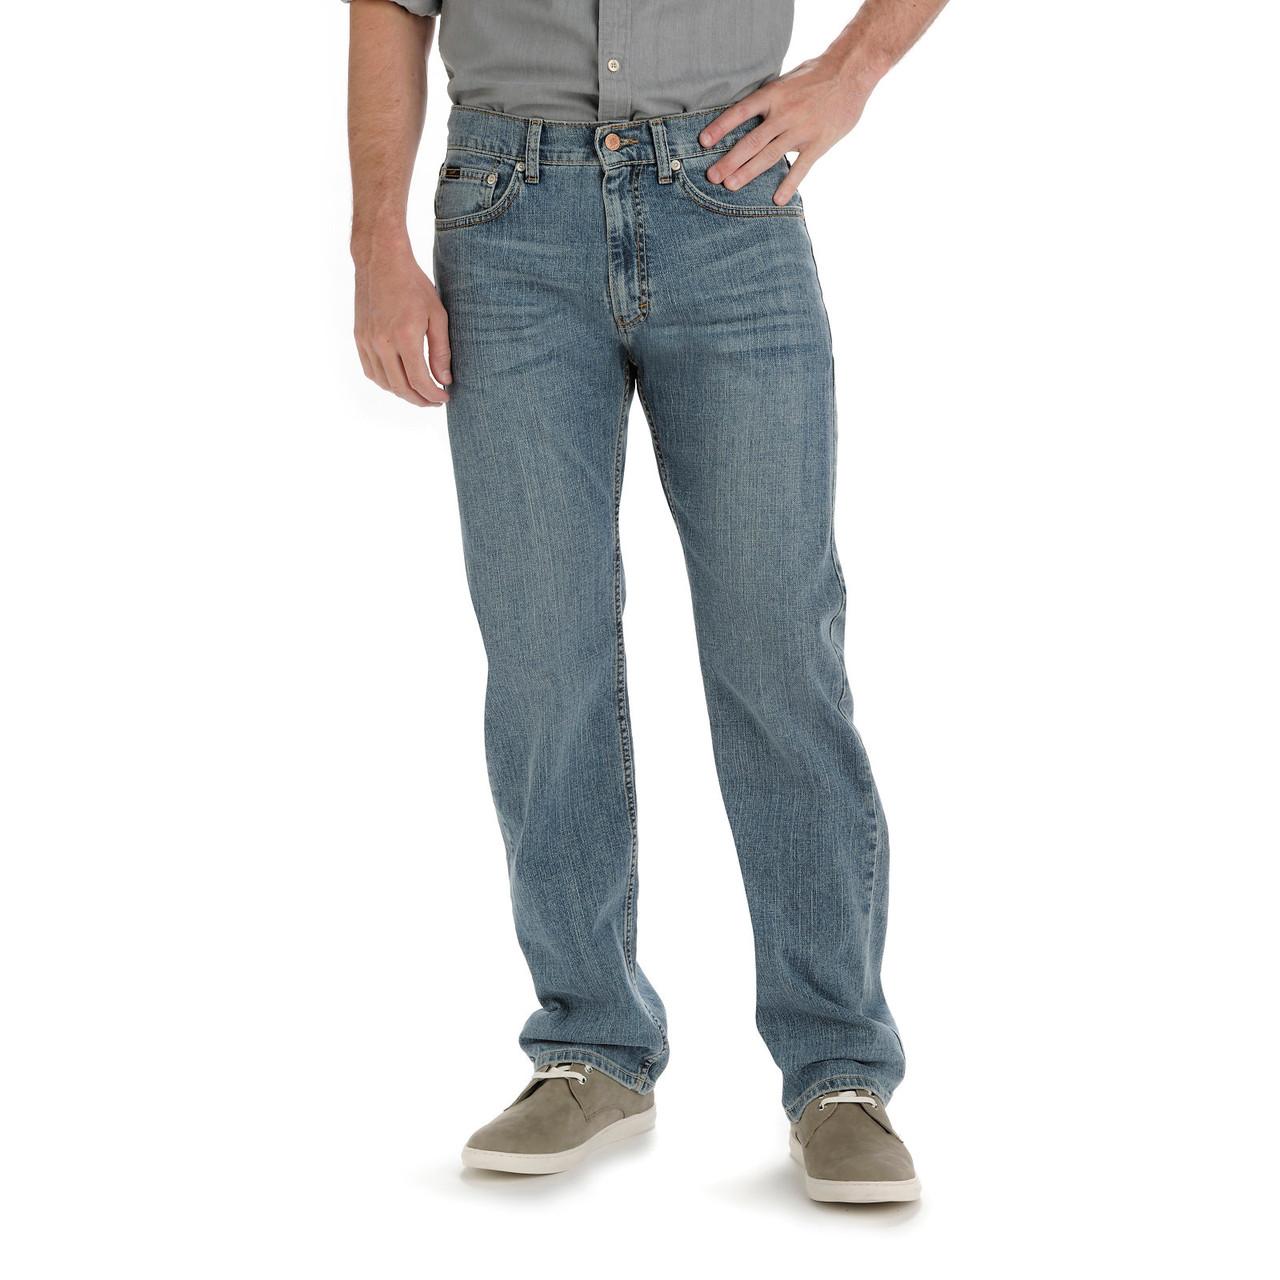 Джинсы Lee Premium Select Regular Fit Straight Leg, Phantom, 34W30L, 2001945, фото 1